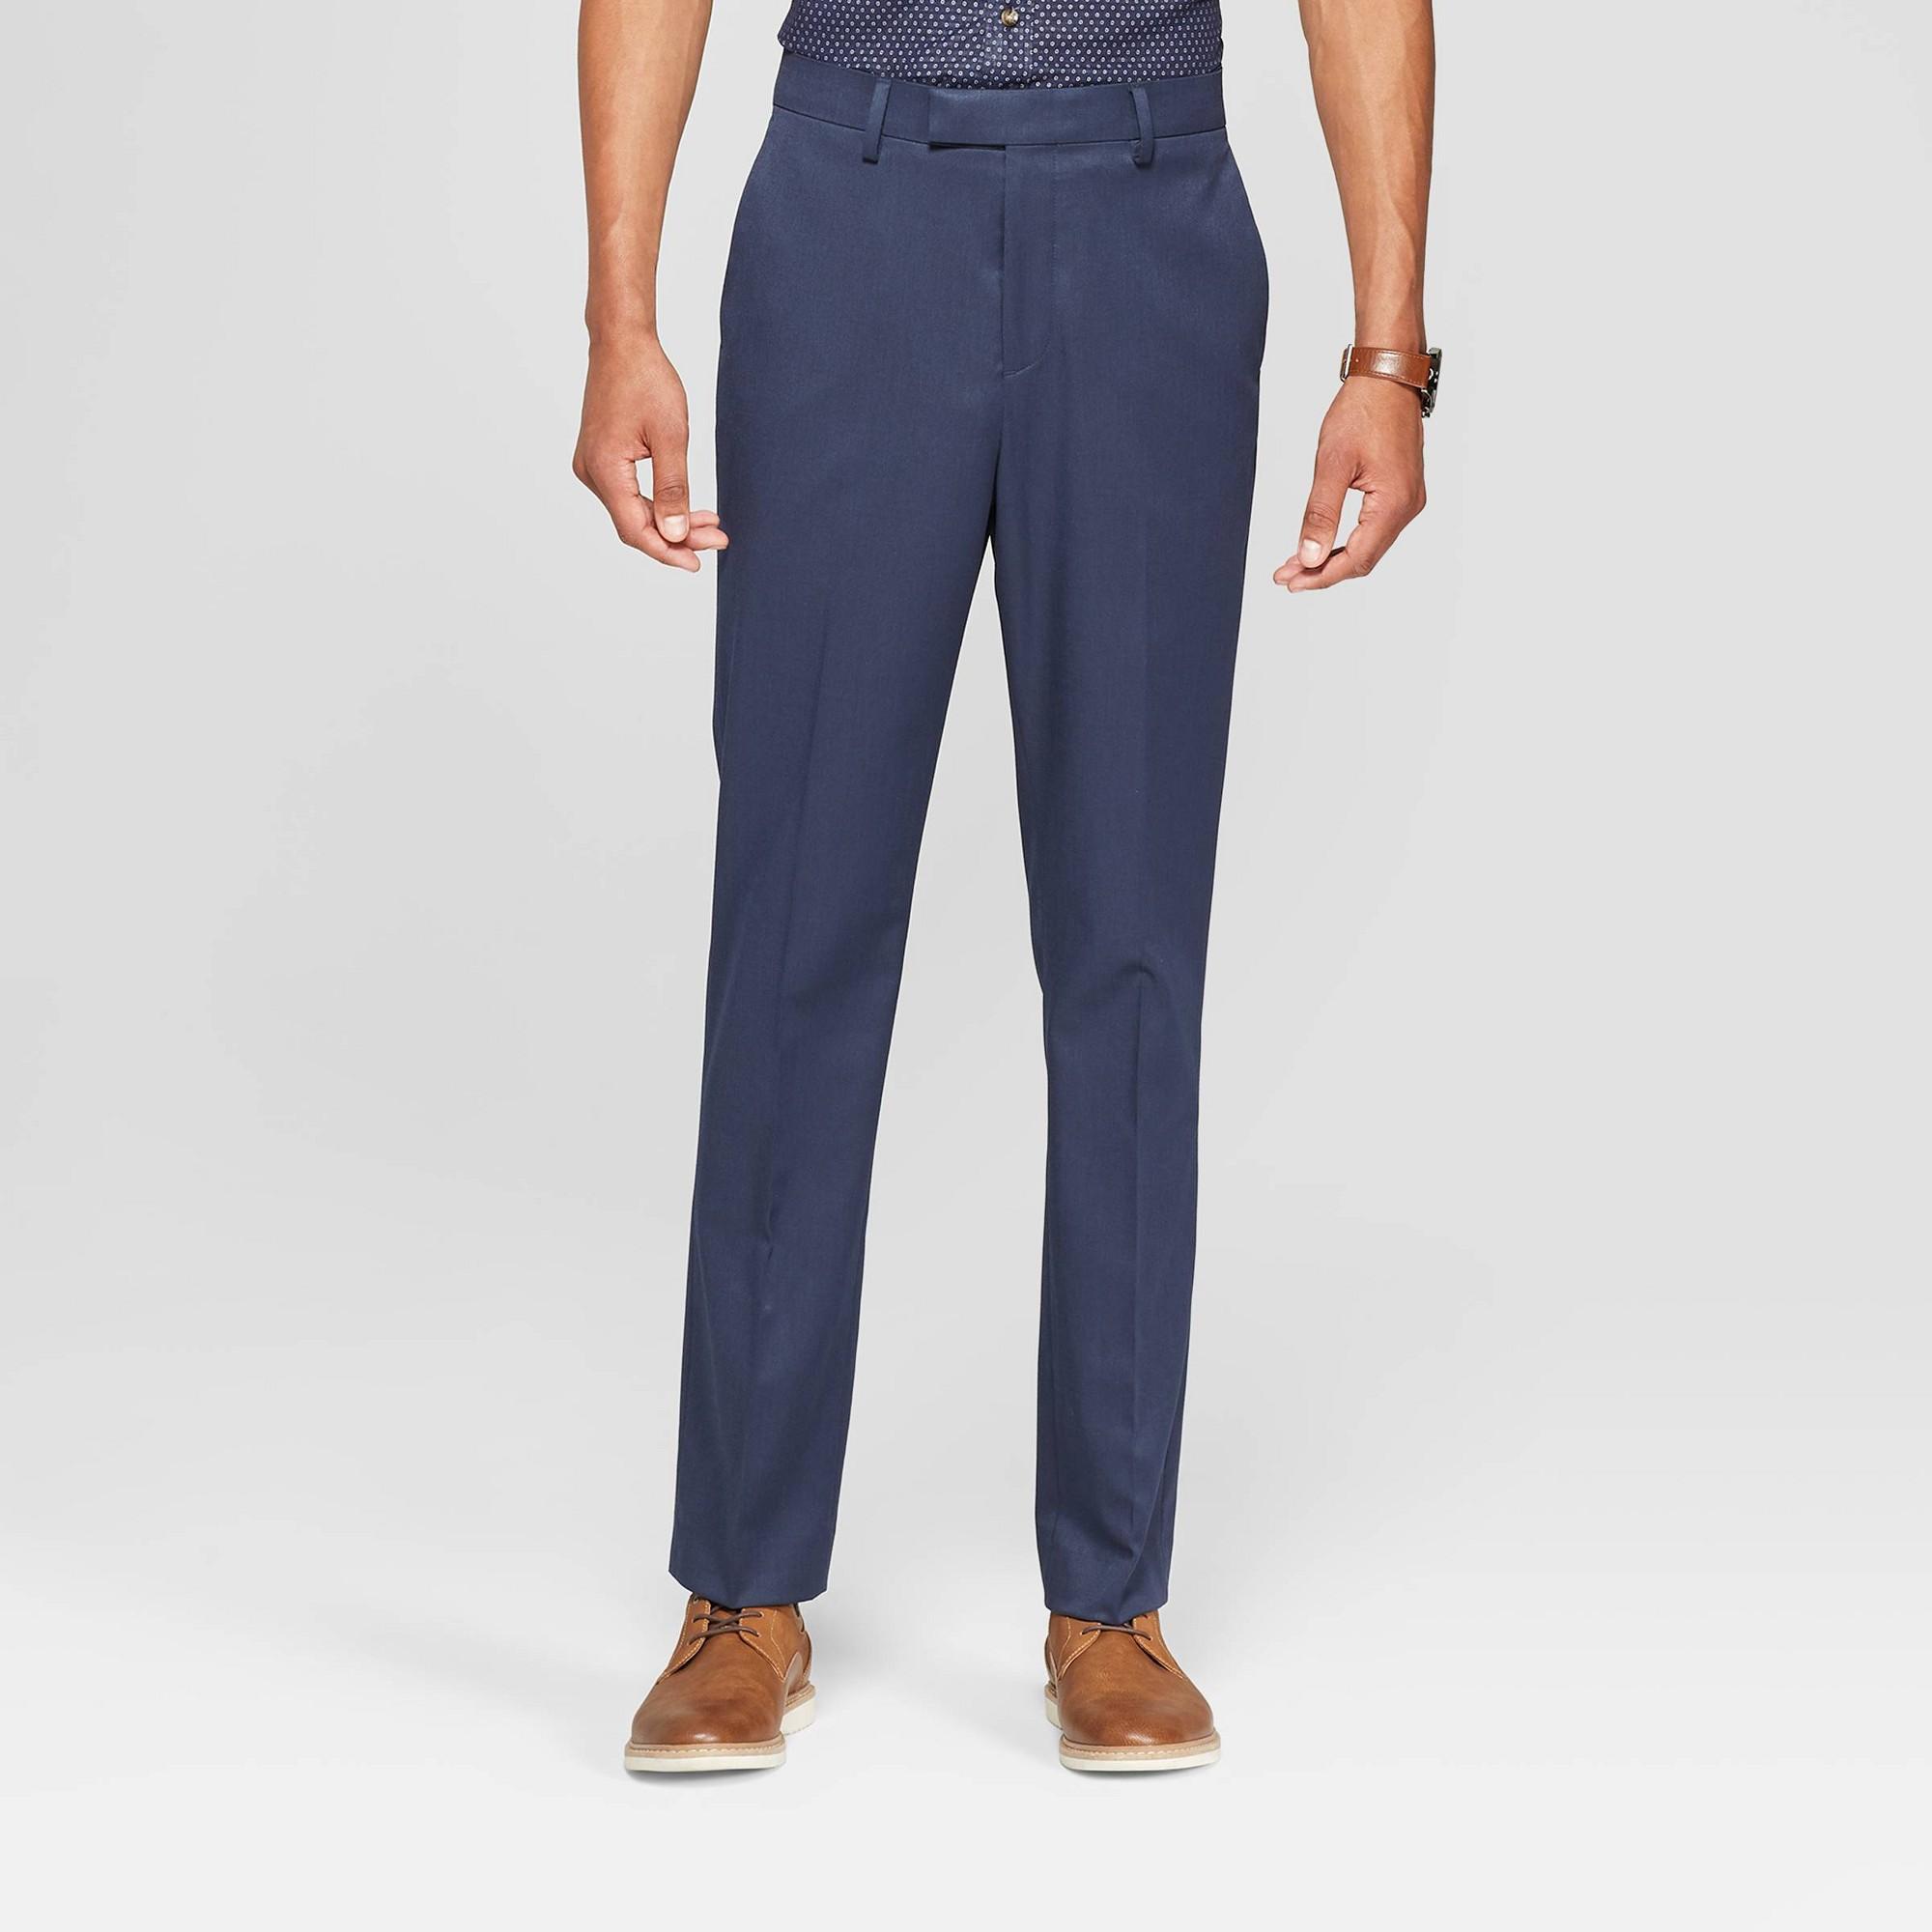 Men's 28 Slim Fit Suit Pants - Goodfellow & Co In The Navy 36x28